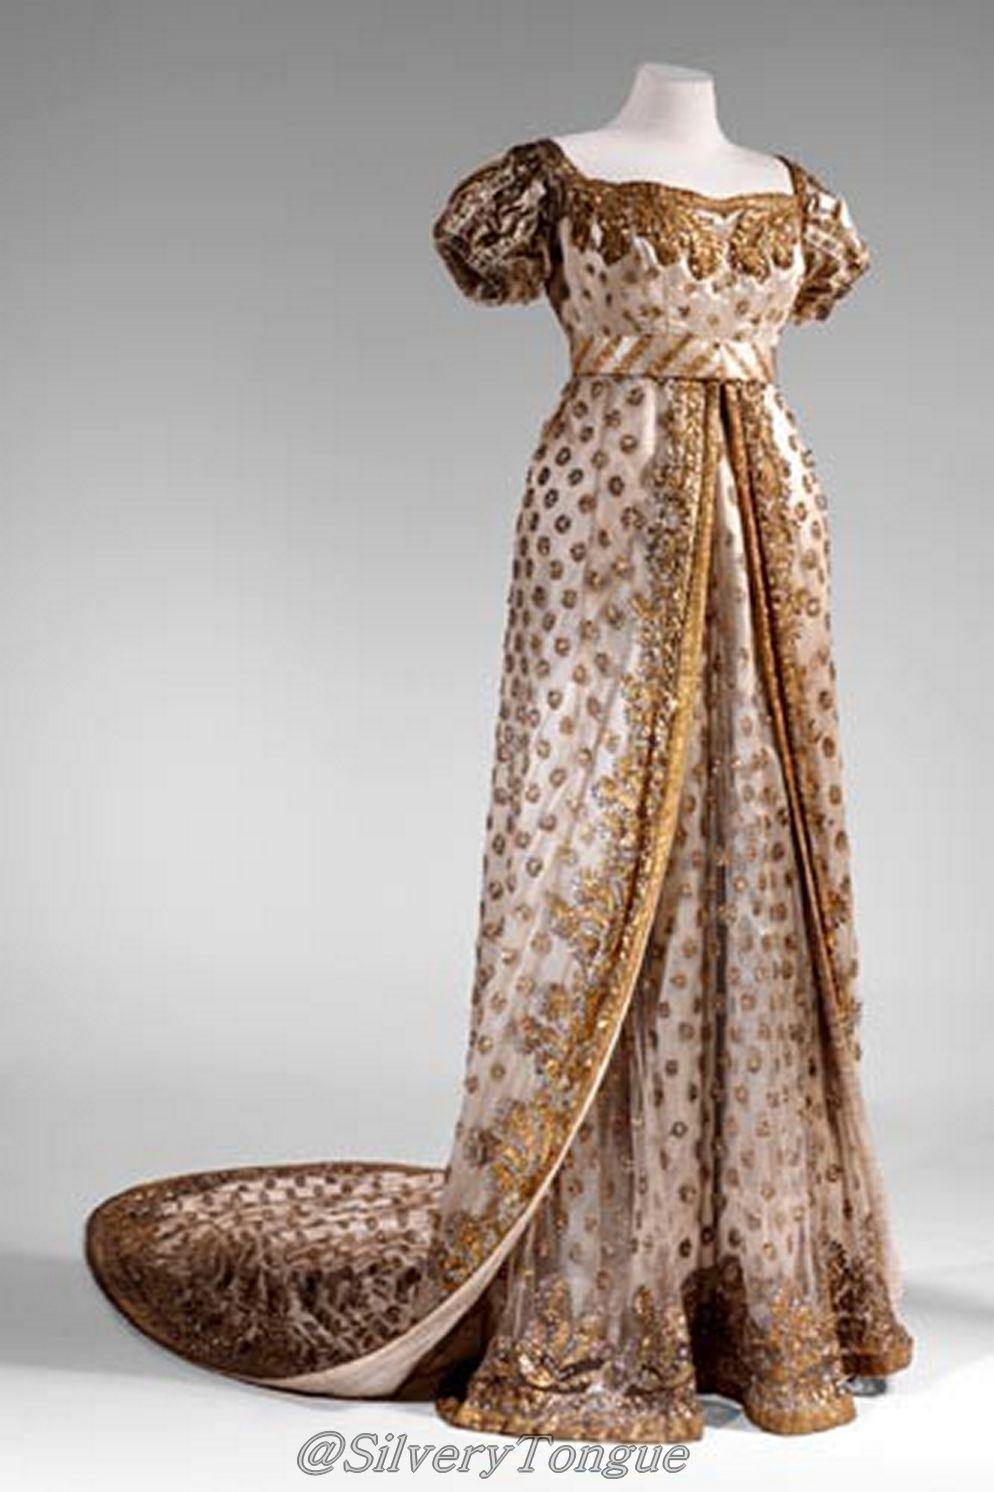 Dress worn to the wedding of napoleon bonaparte and marielouise